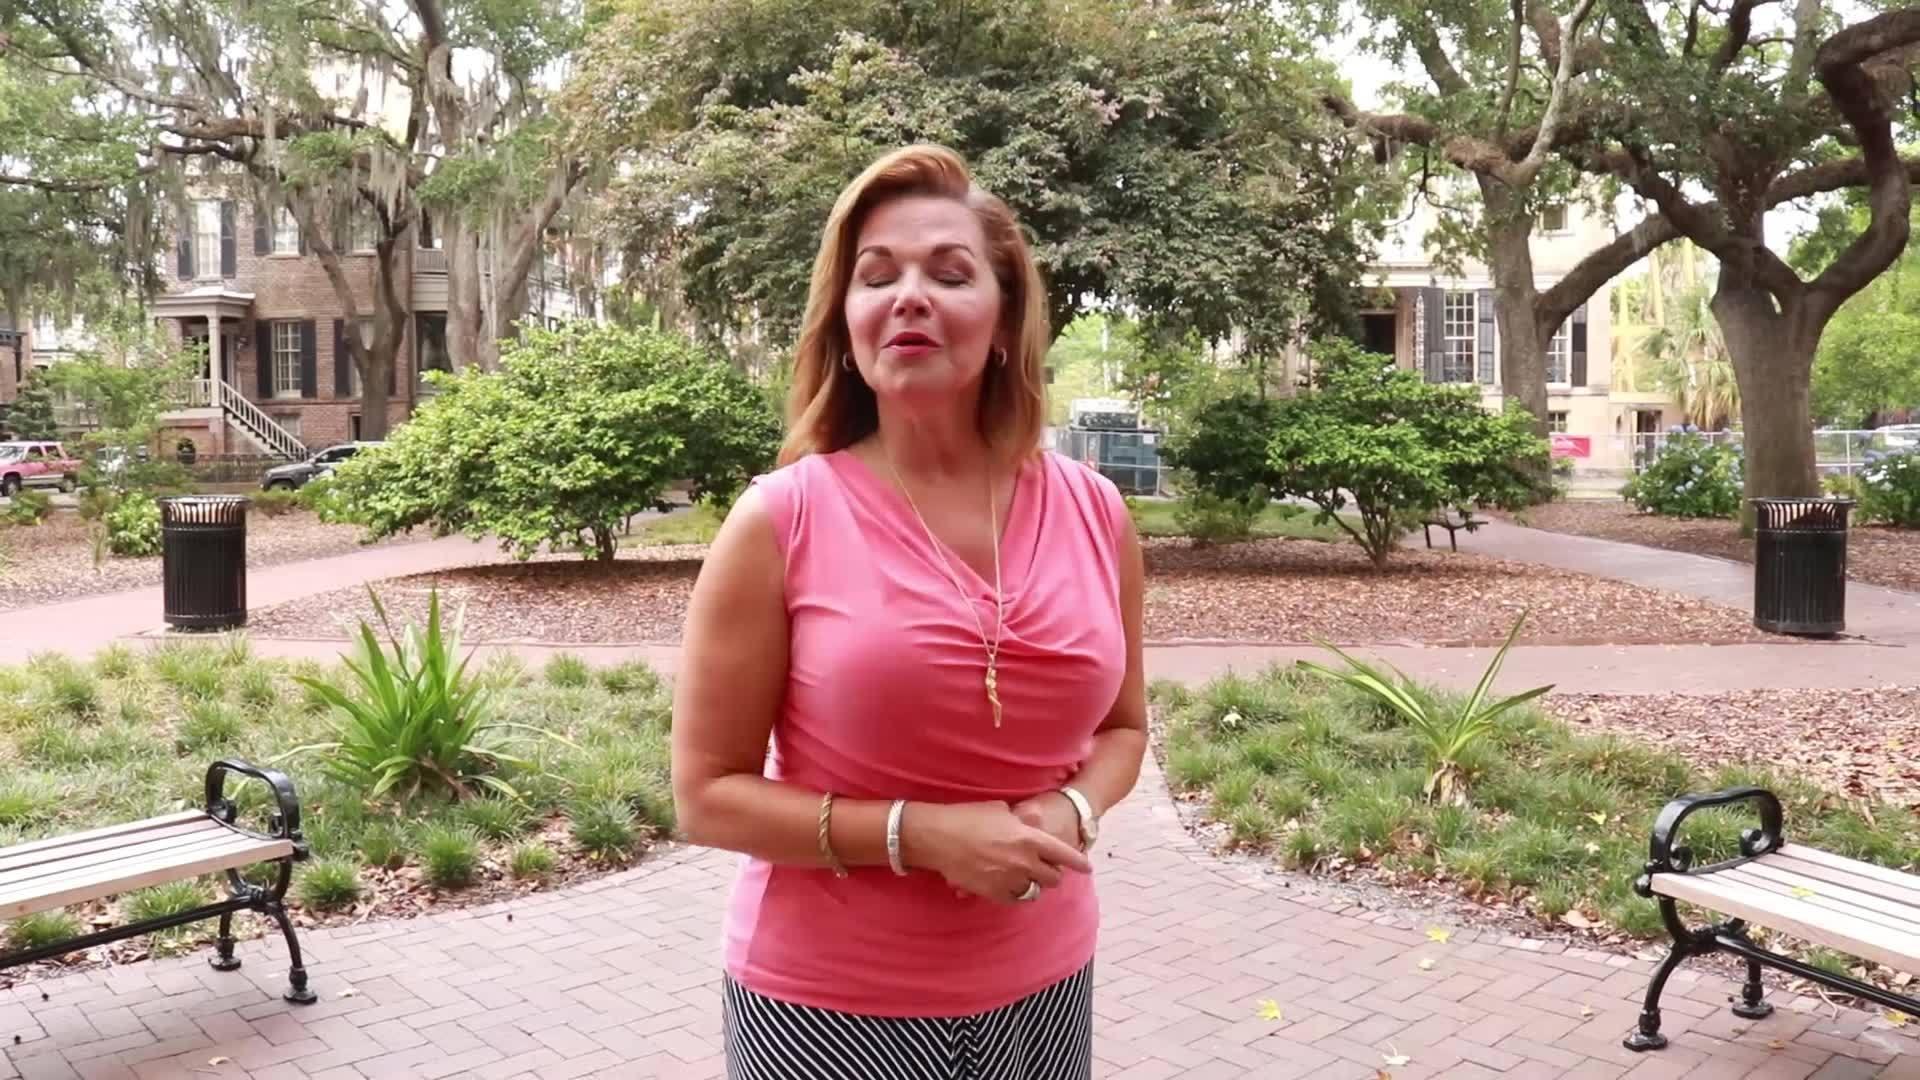 Help_For_Women_Experiencing__MenoFog__0_20190530140955